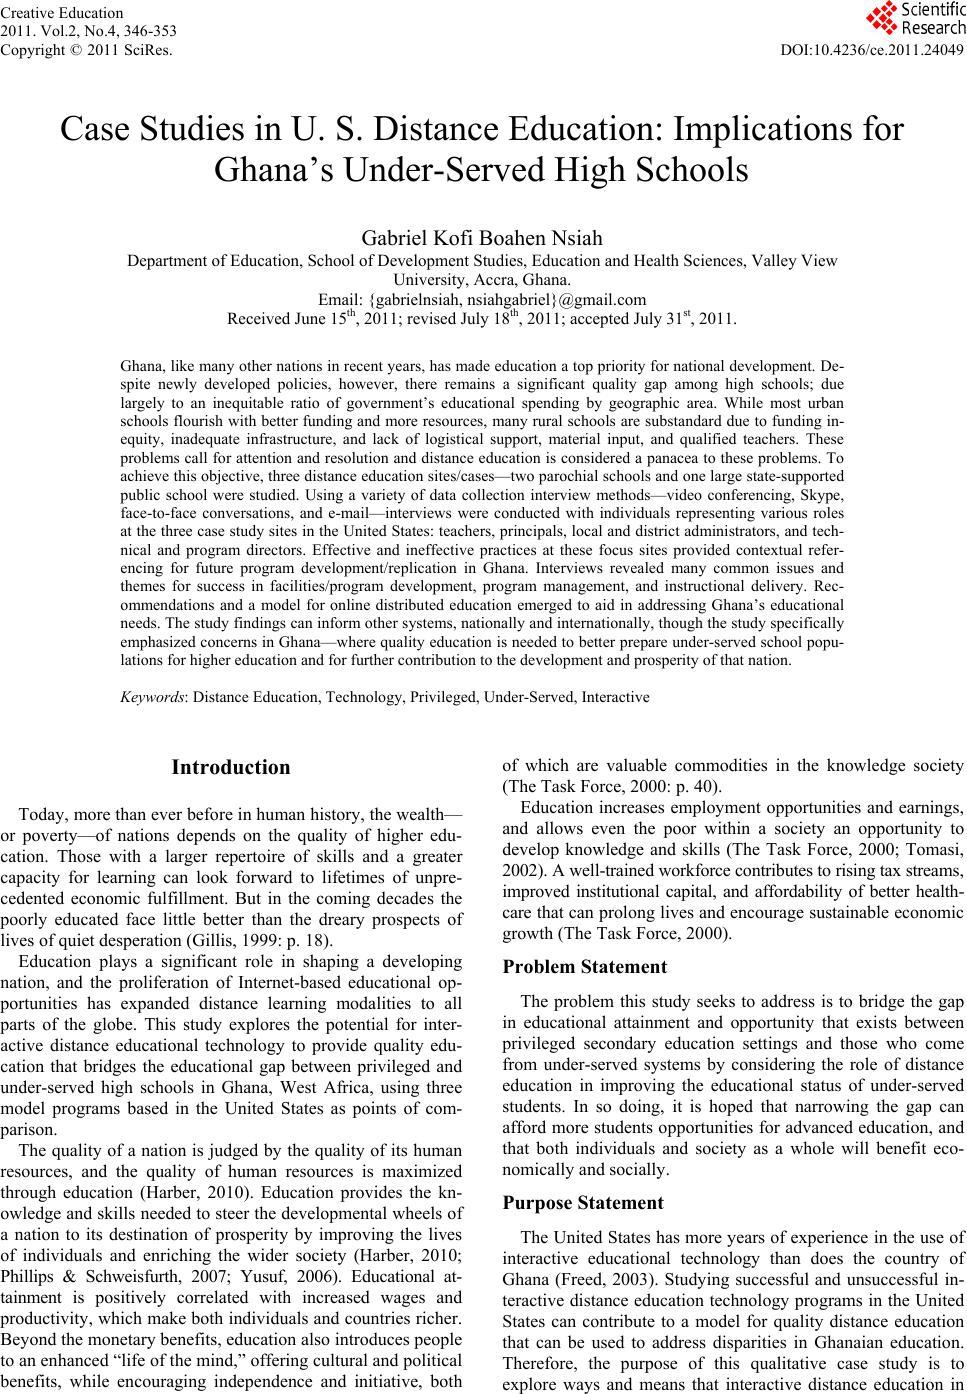 criminology case study essay